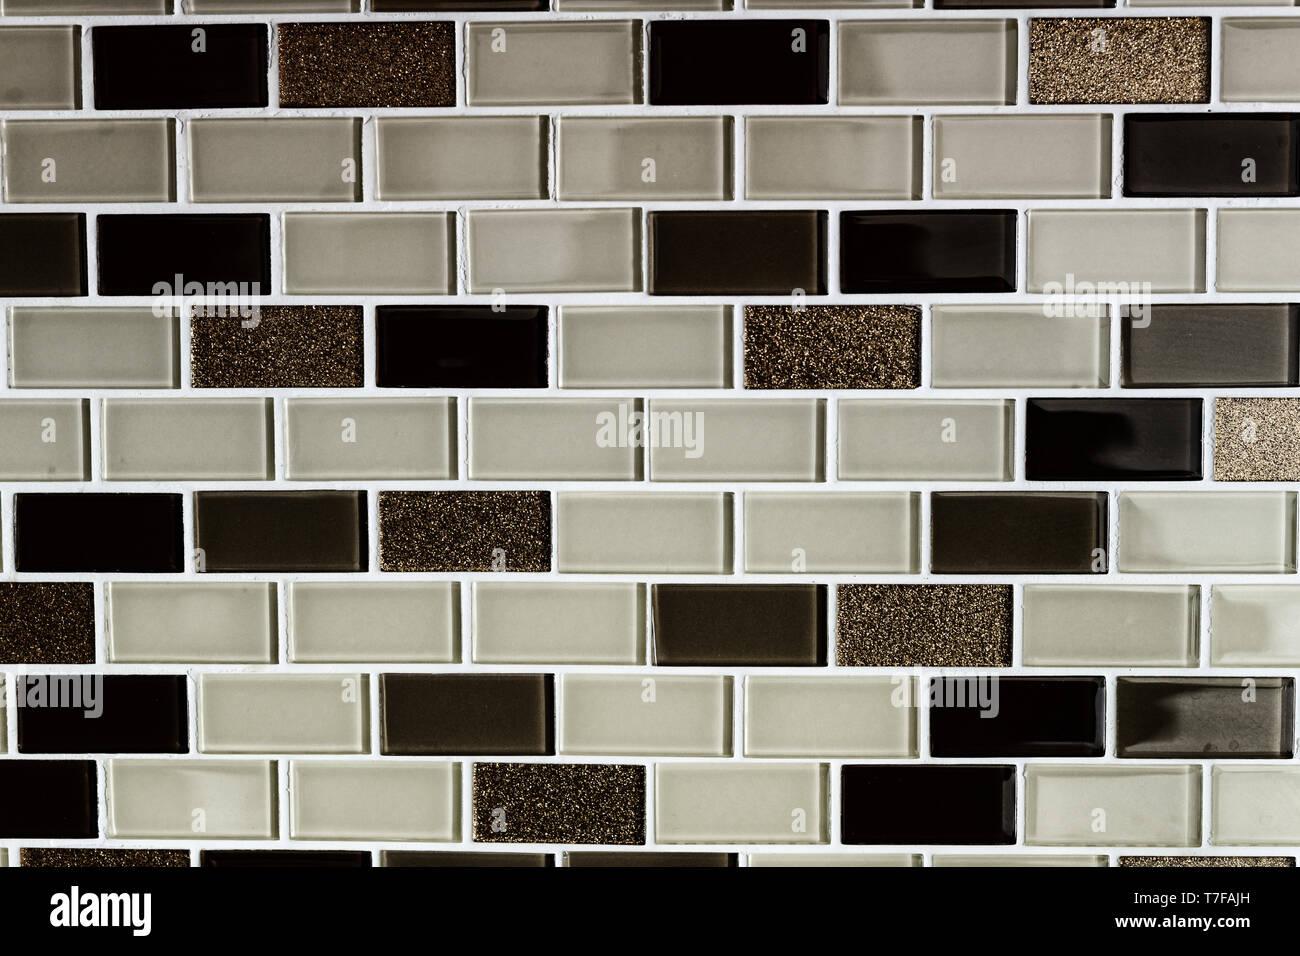 https www alamyimages fr tons noir blanc marron carrelage mural cuisine modele texture background close up image245585385 html